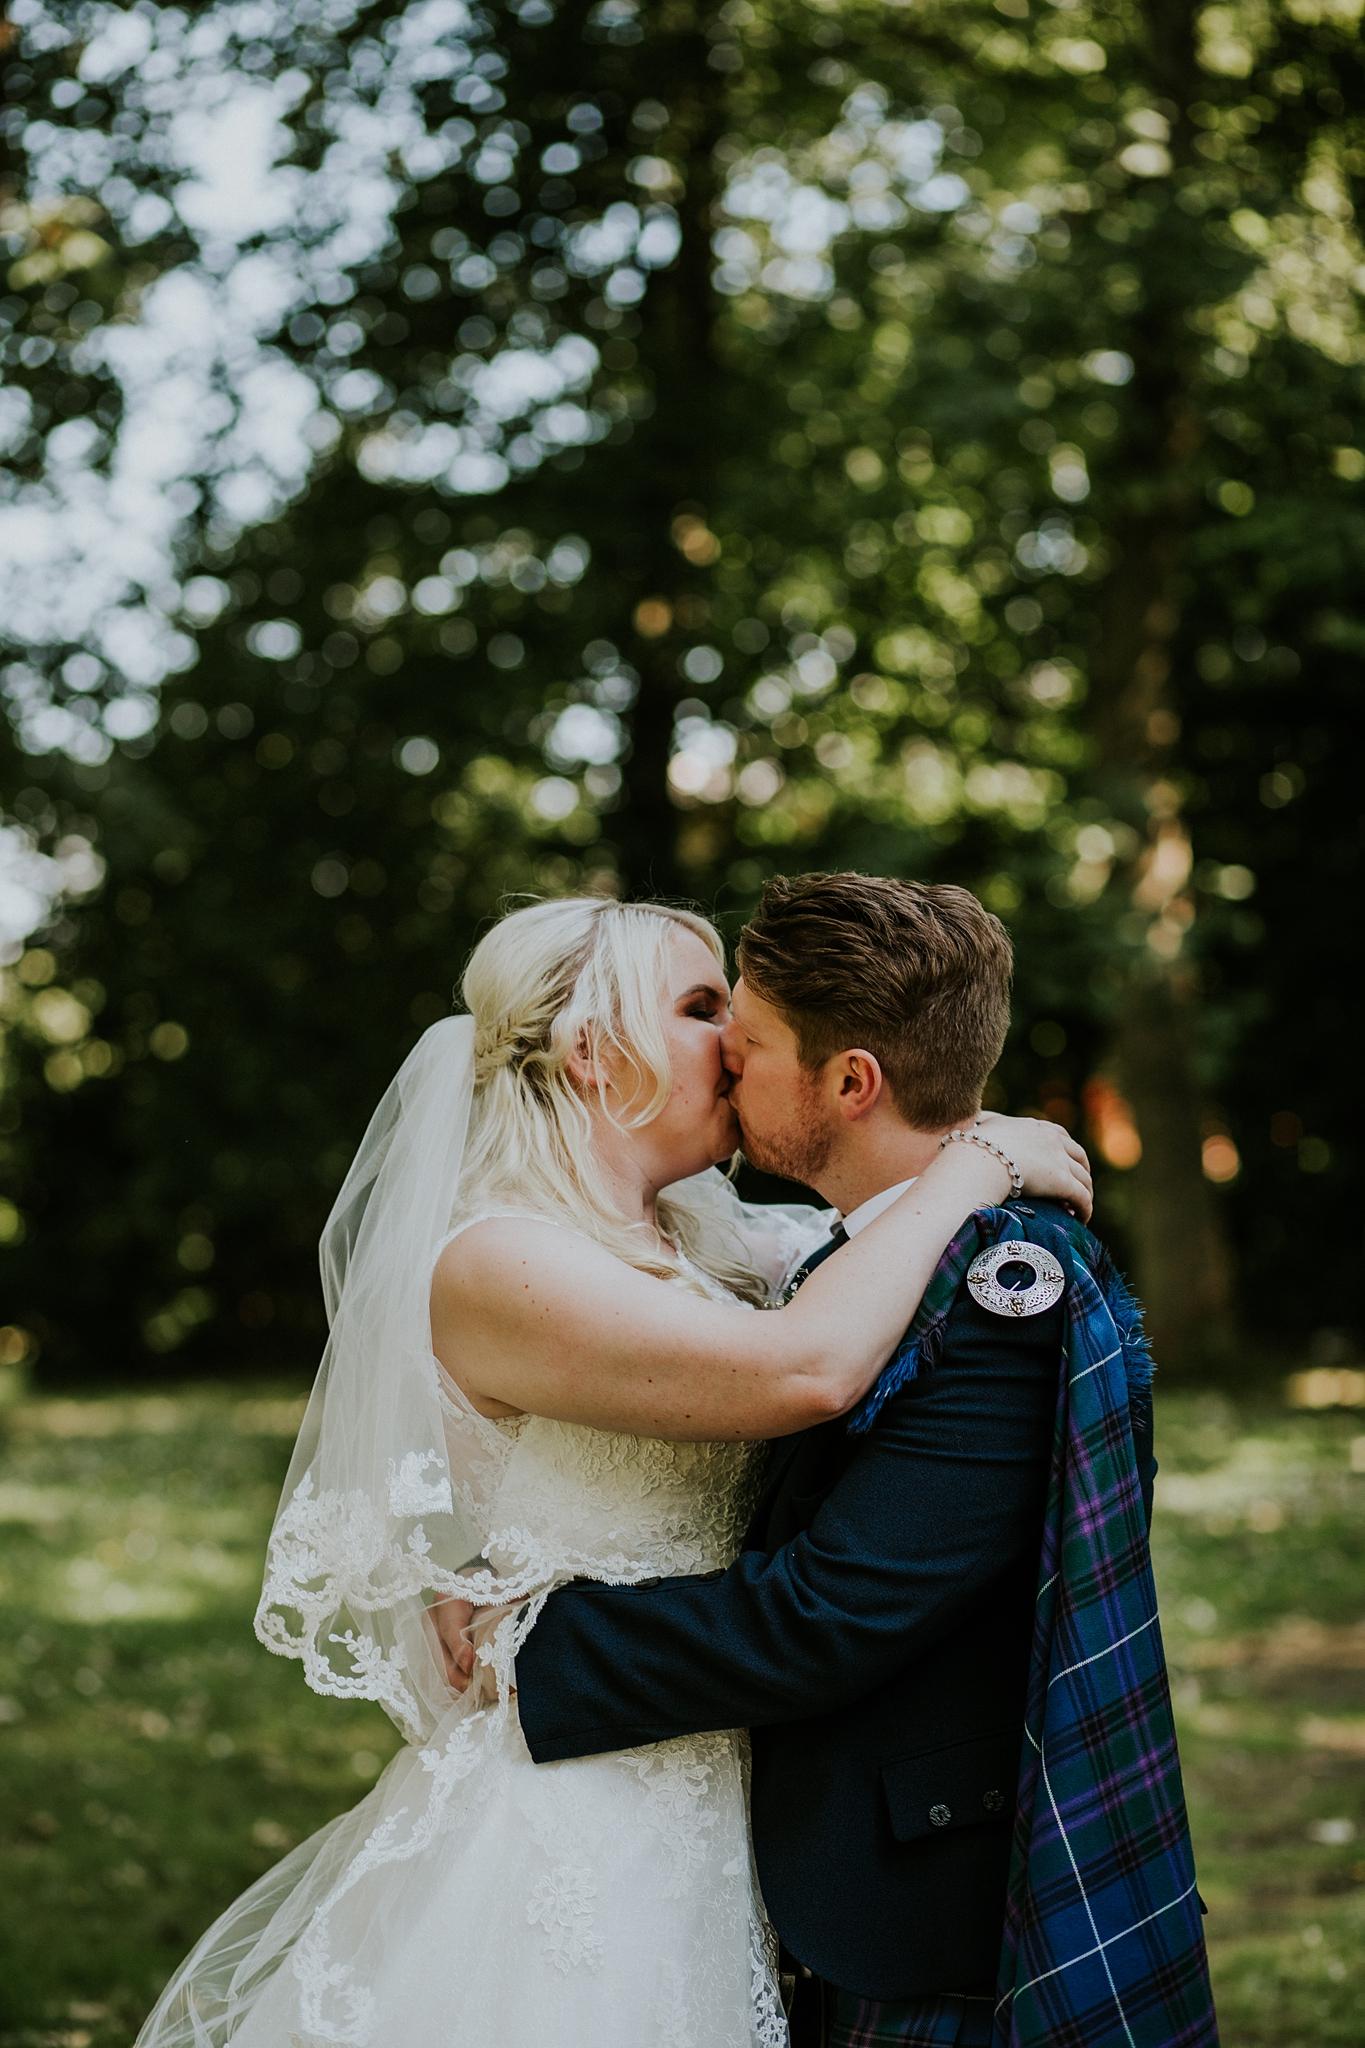 Mark_Alison_Pollockshields_Burgh_Hall_Wedding-29.JPG